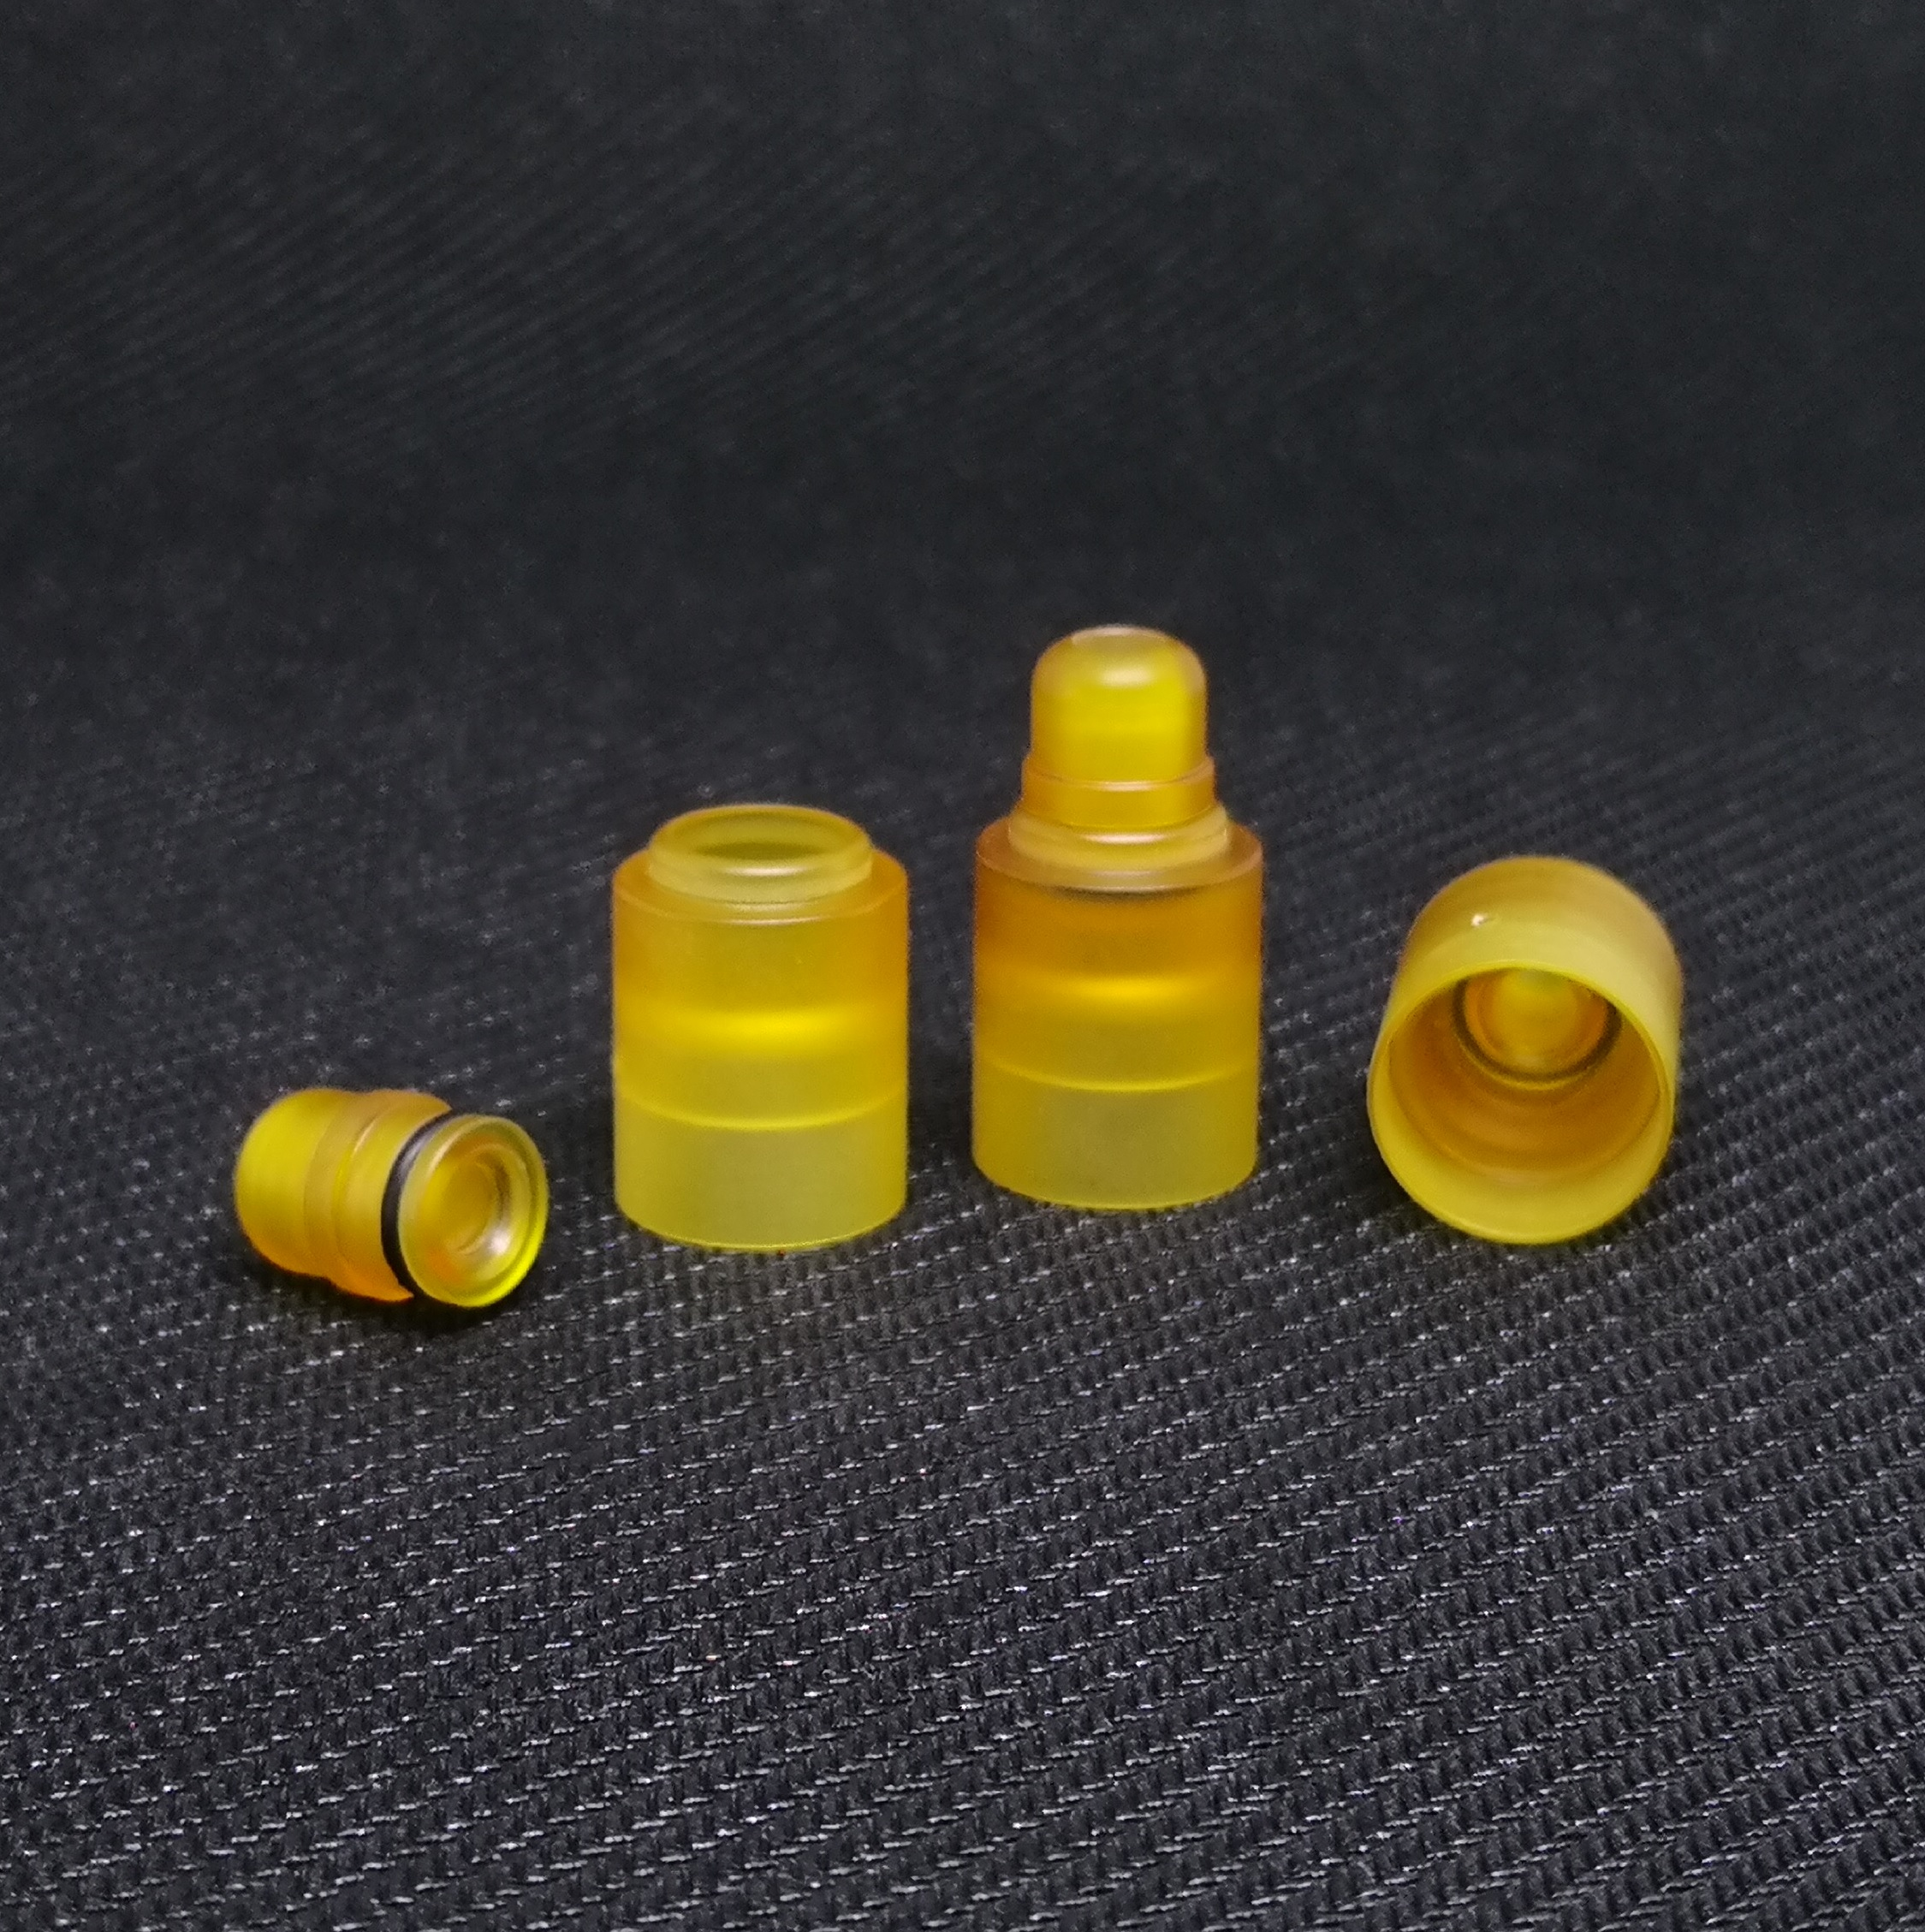 Galactika McFly 14mm Ultem Cap